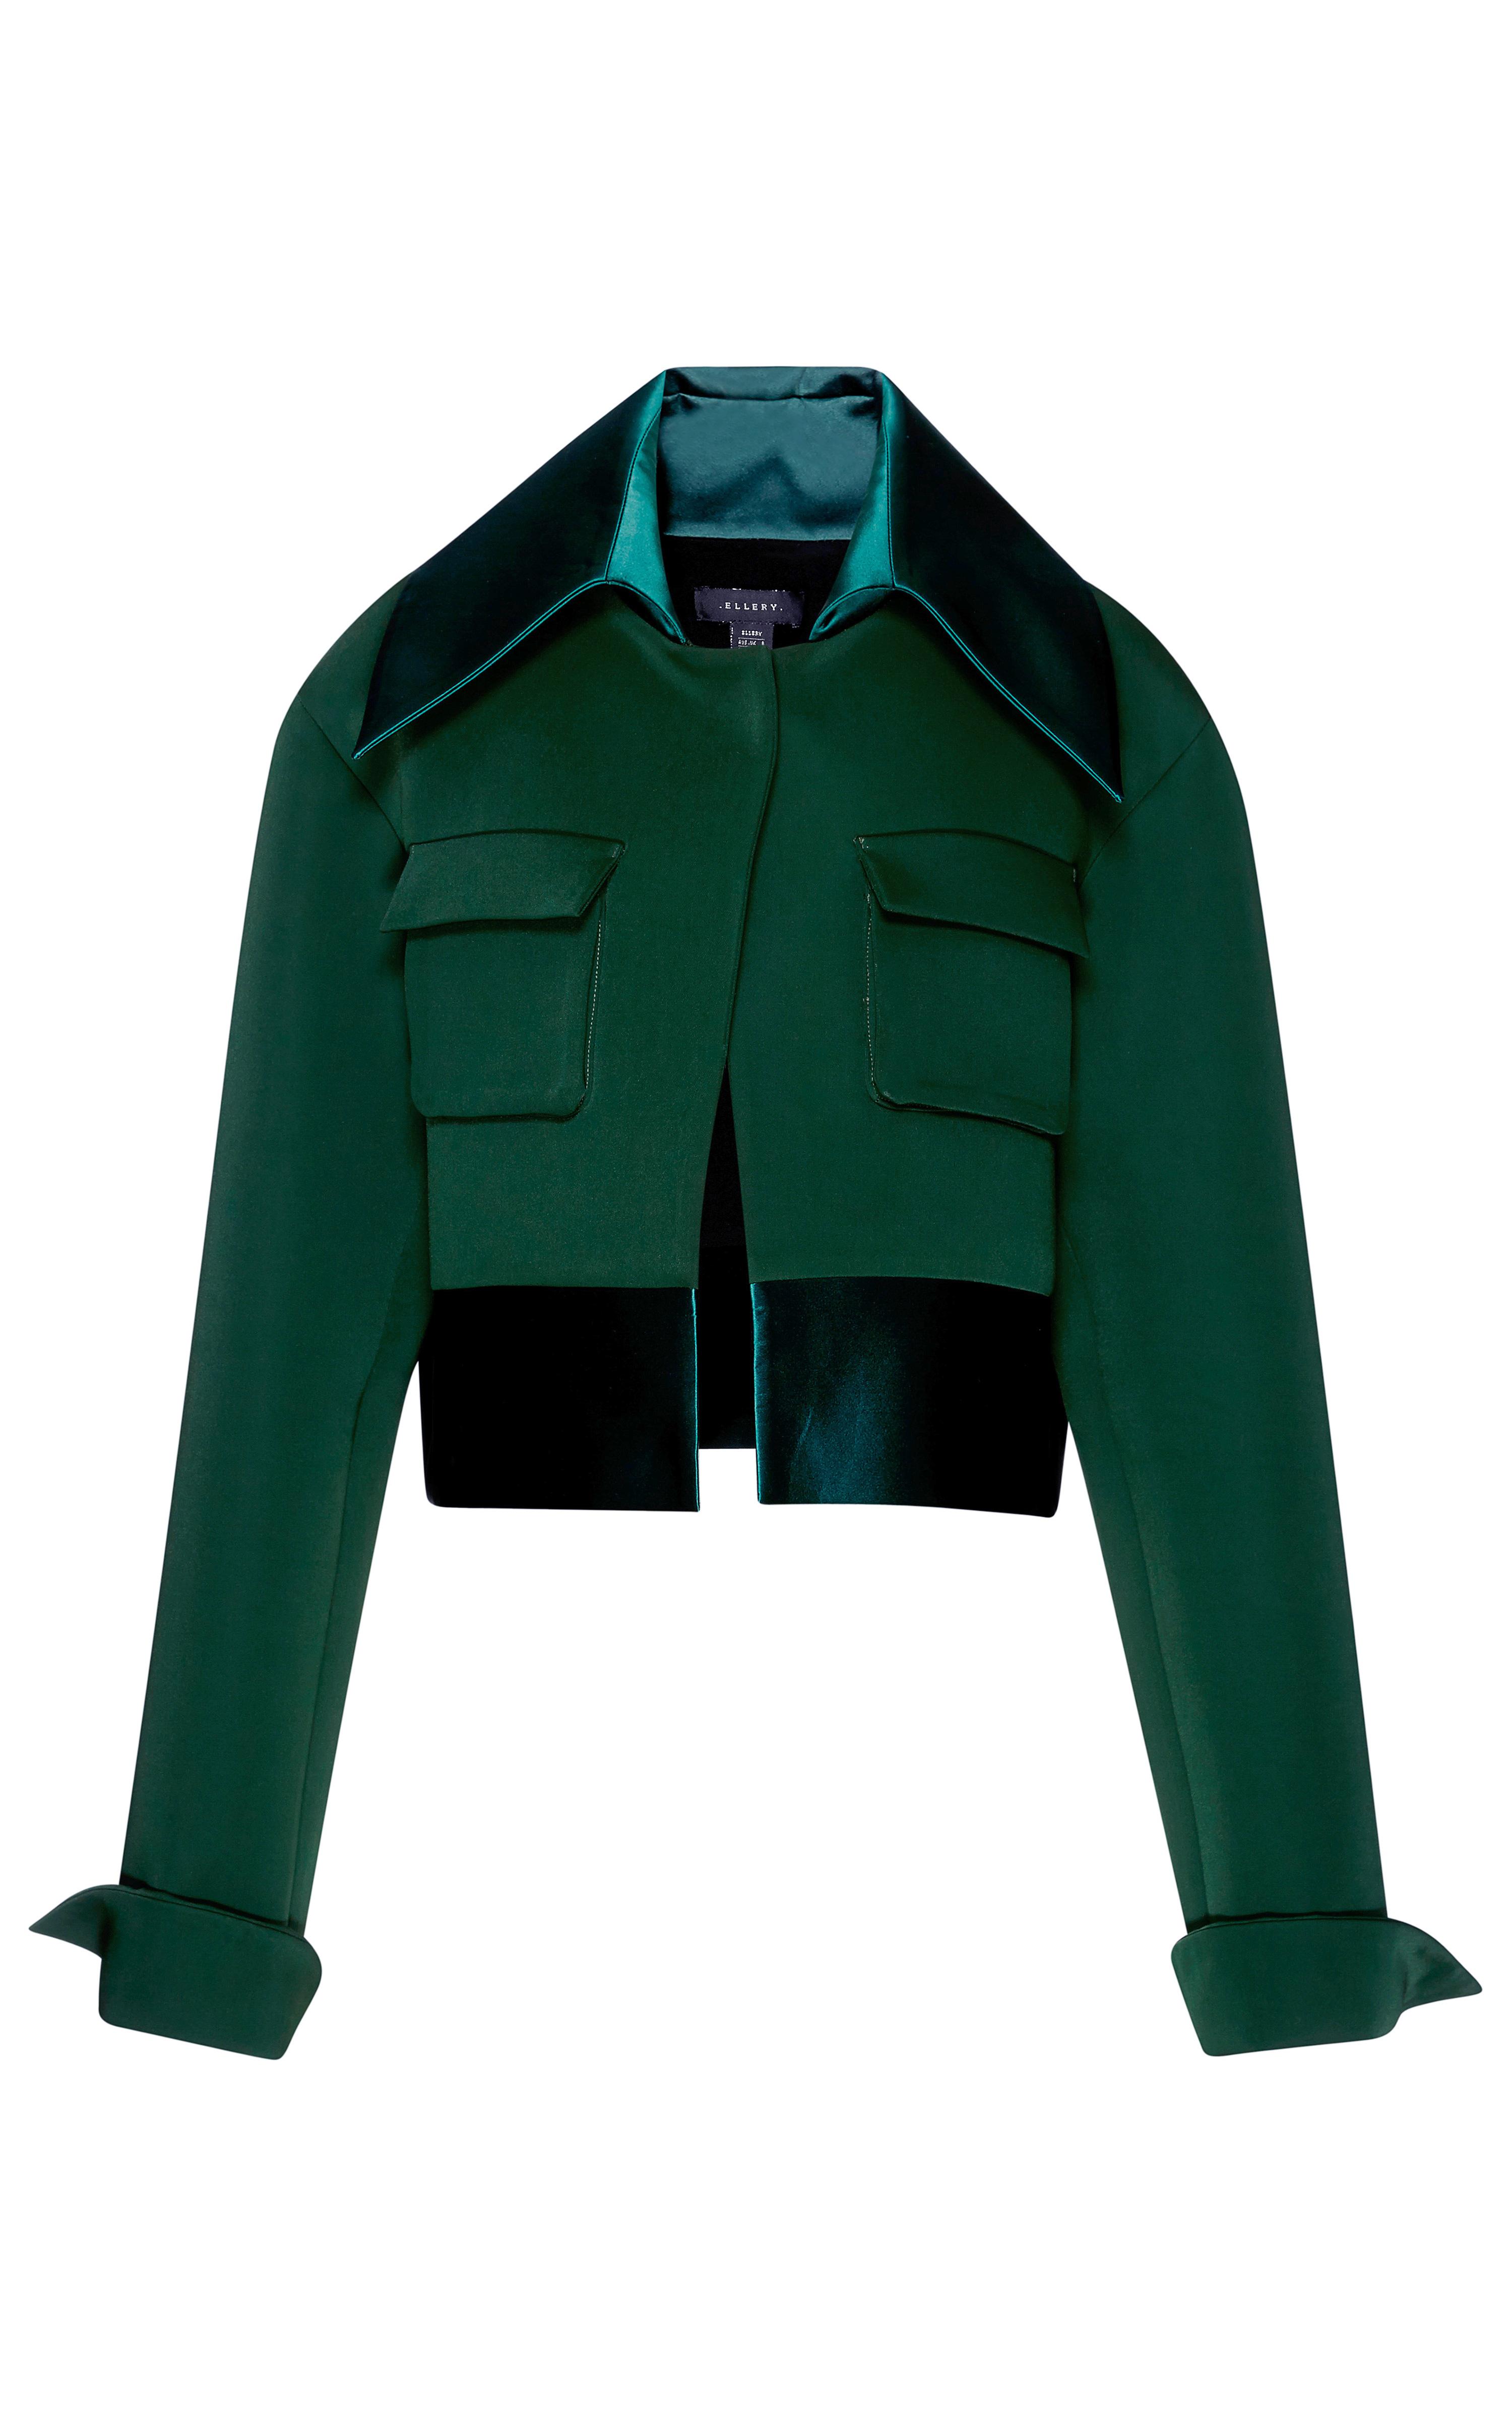 Ellery Boxy Jacket - Forest Green in Green | Lyst